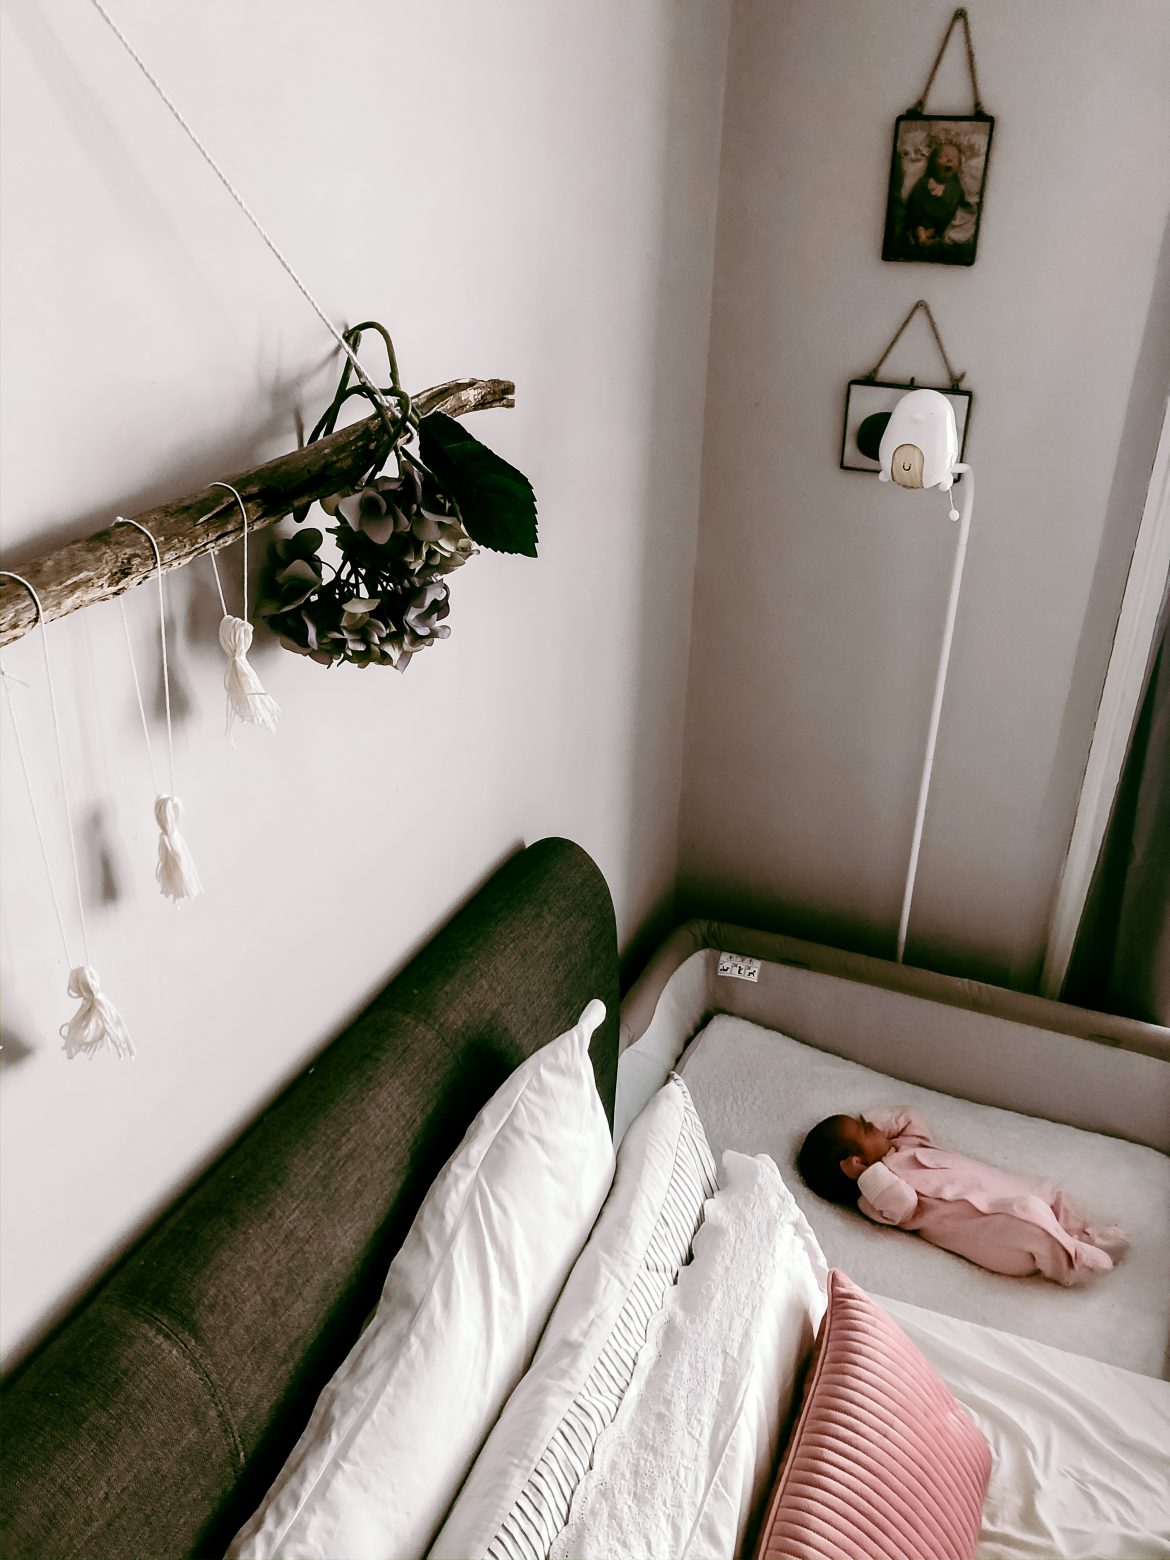 Baby lying in a crib